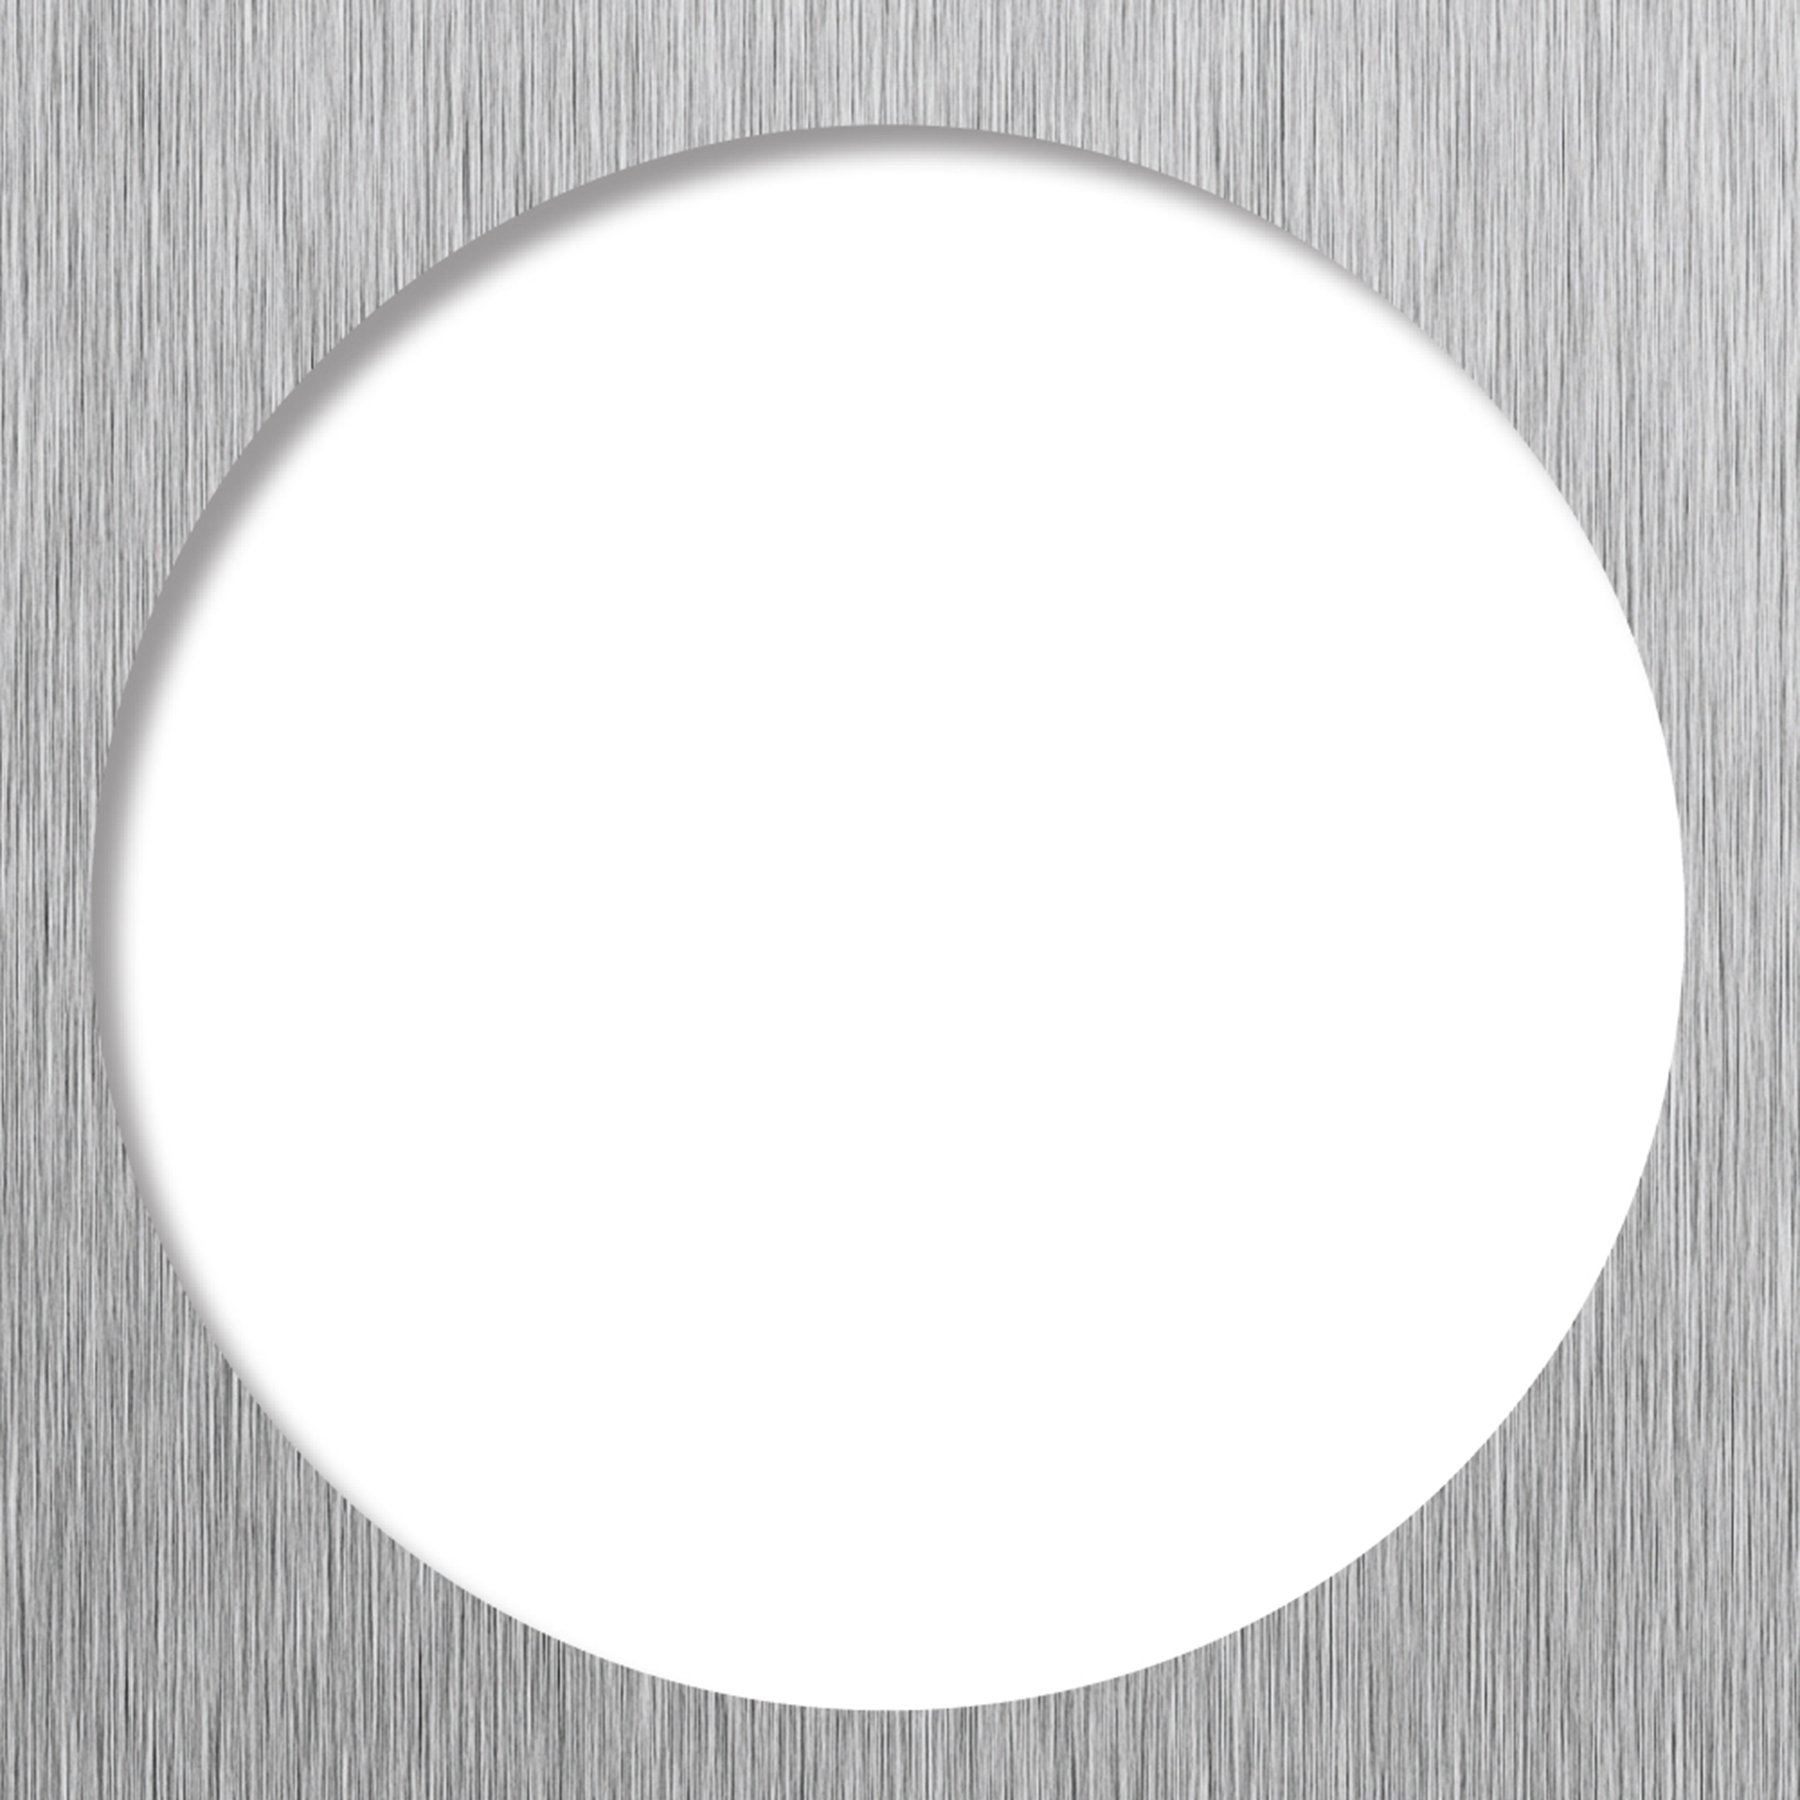 Tile Redi USA DP-SQT-BN Redi Drain with Brushed Nickel Drain with Plate Trim by Tile Redi USA